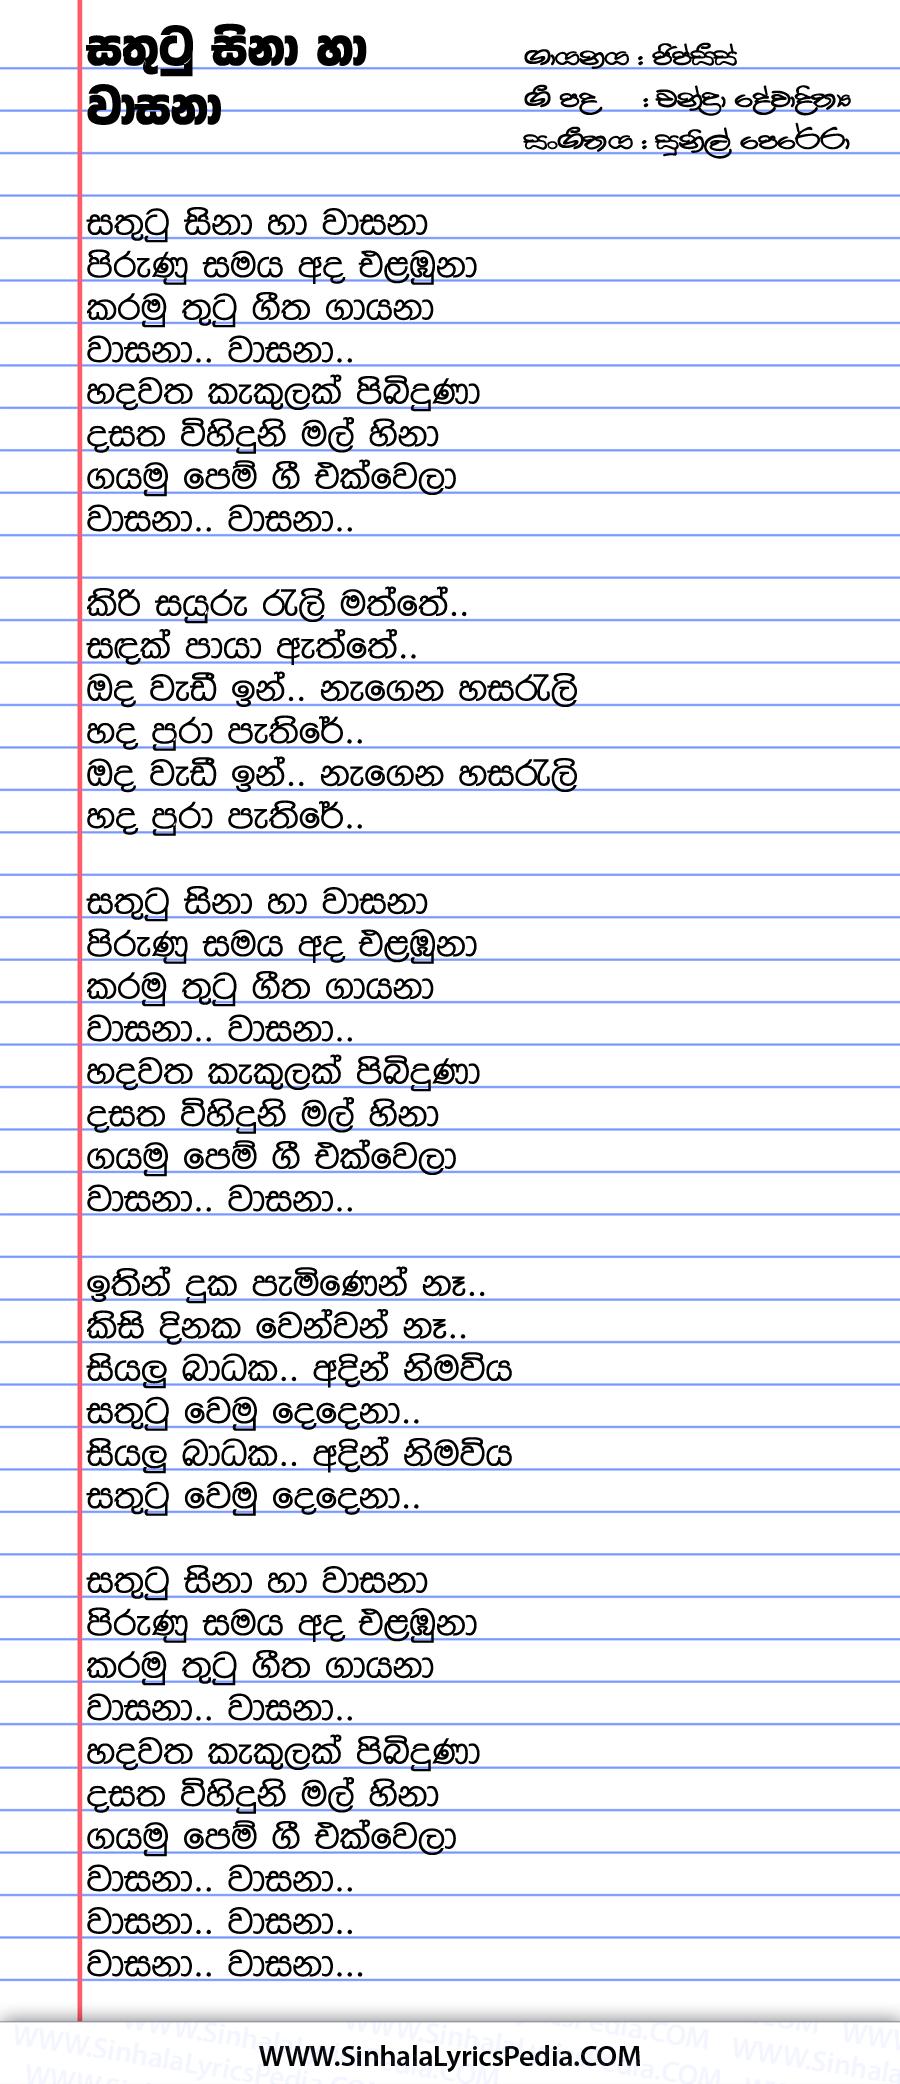 Sathutu Sina Ha Wasana Song Lyrics